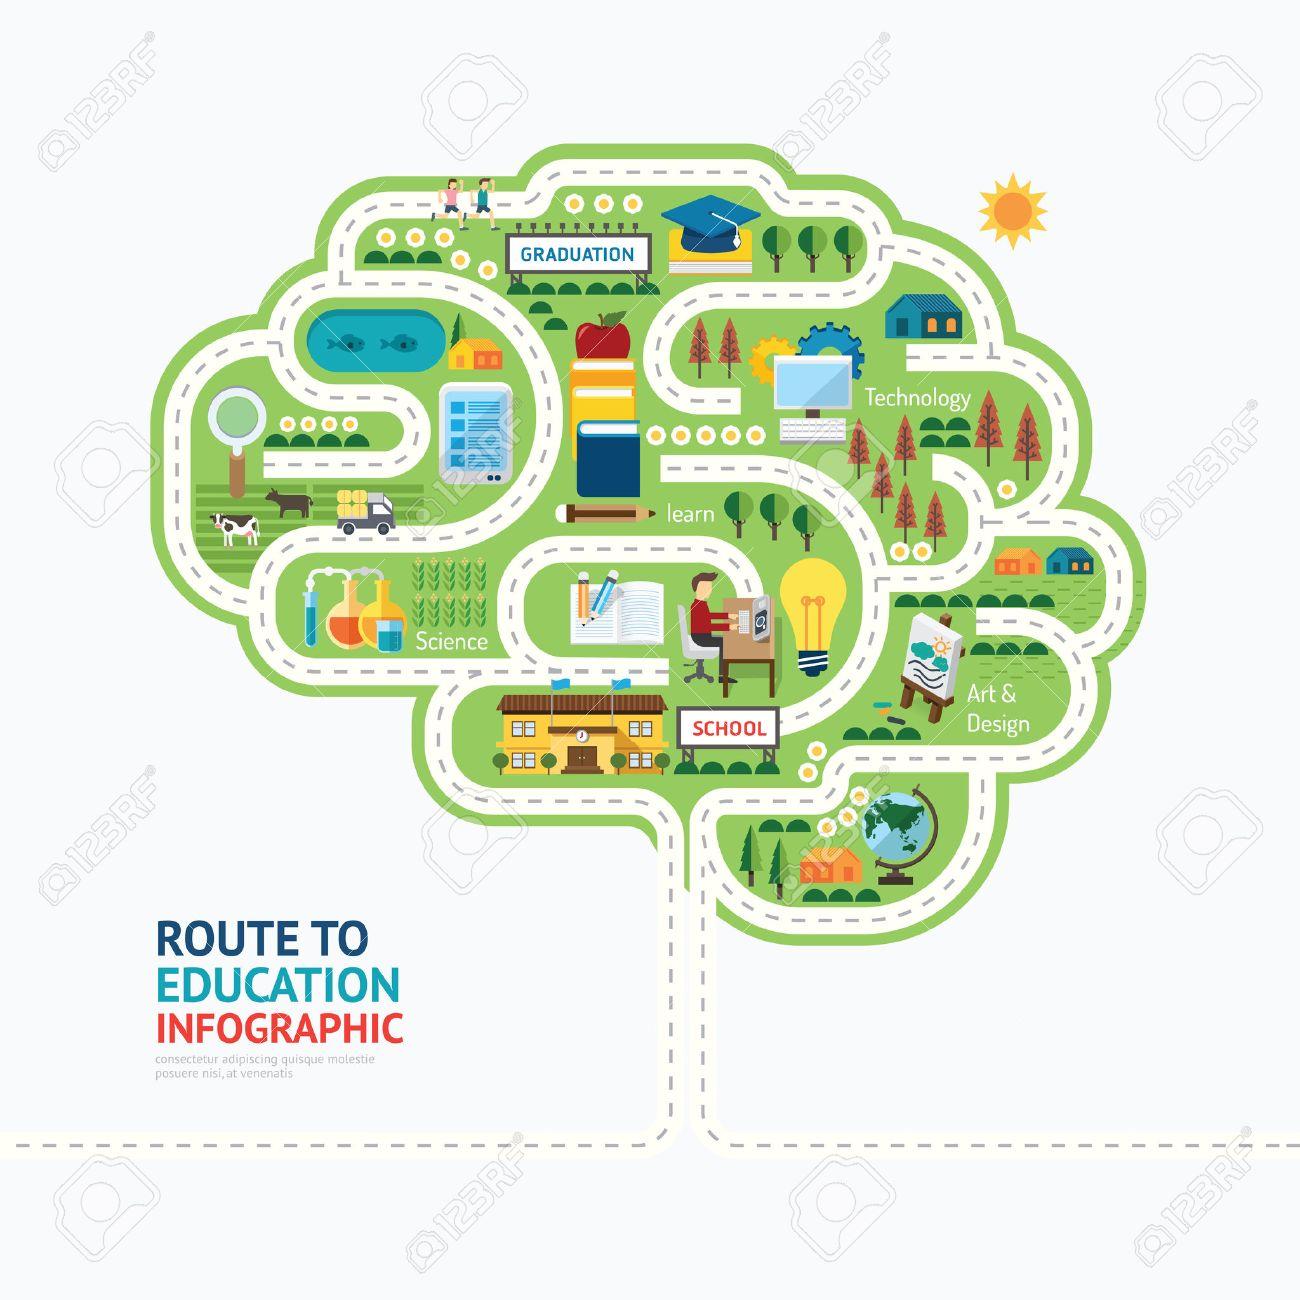 Infographic education human brain shape template design.learn concept vector illustration / graphic or web design layout. Standard-Bild - 39813056